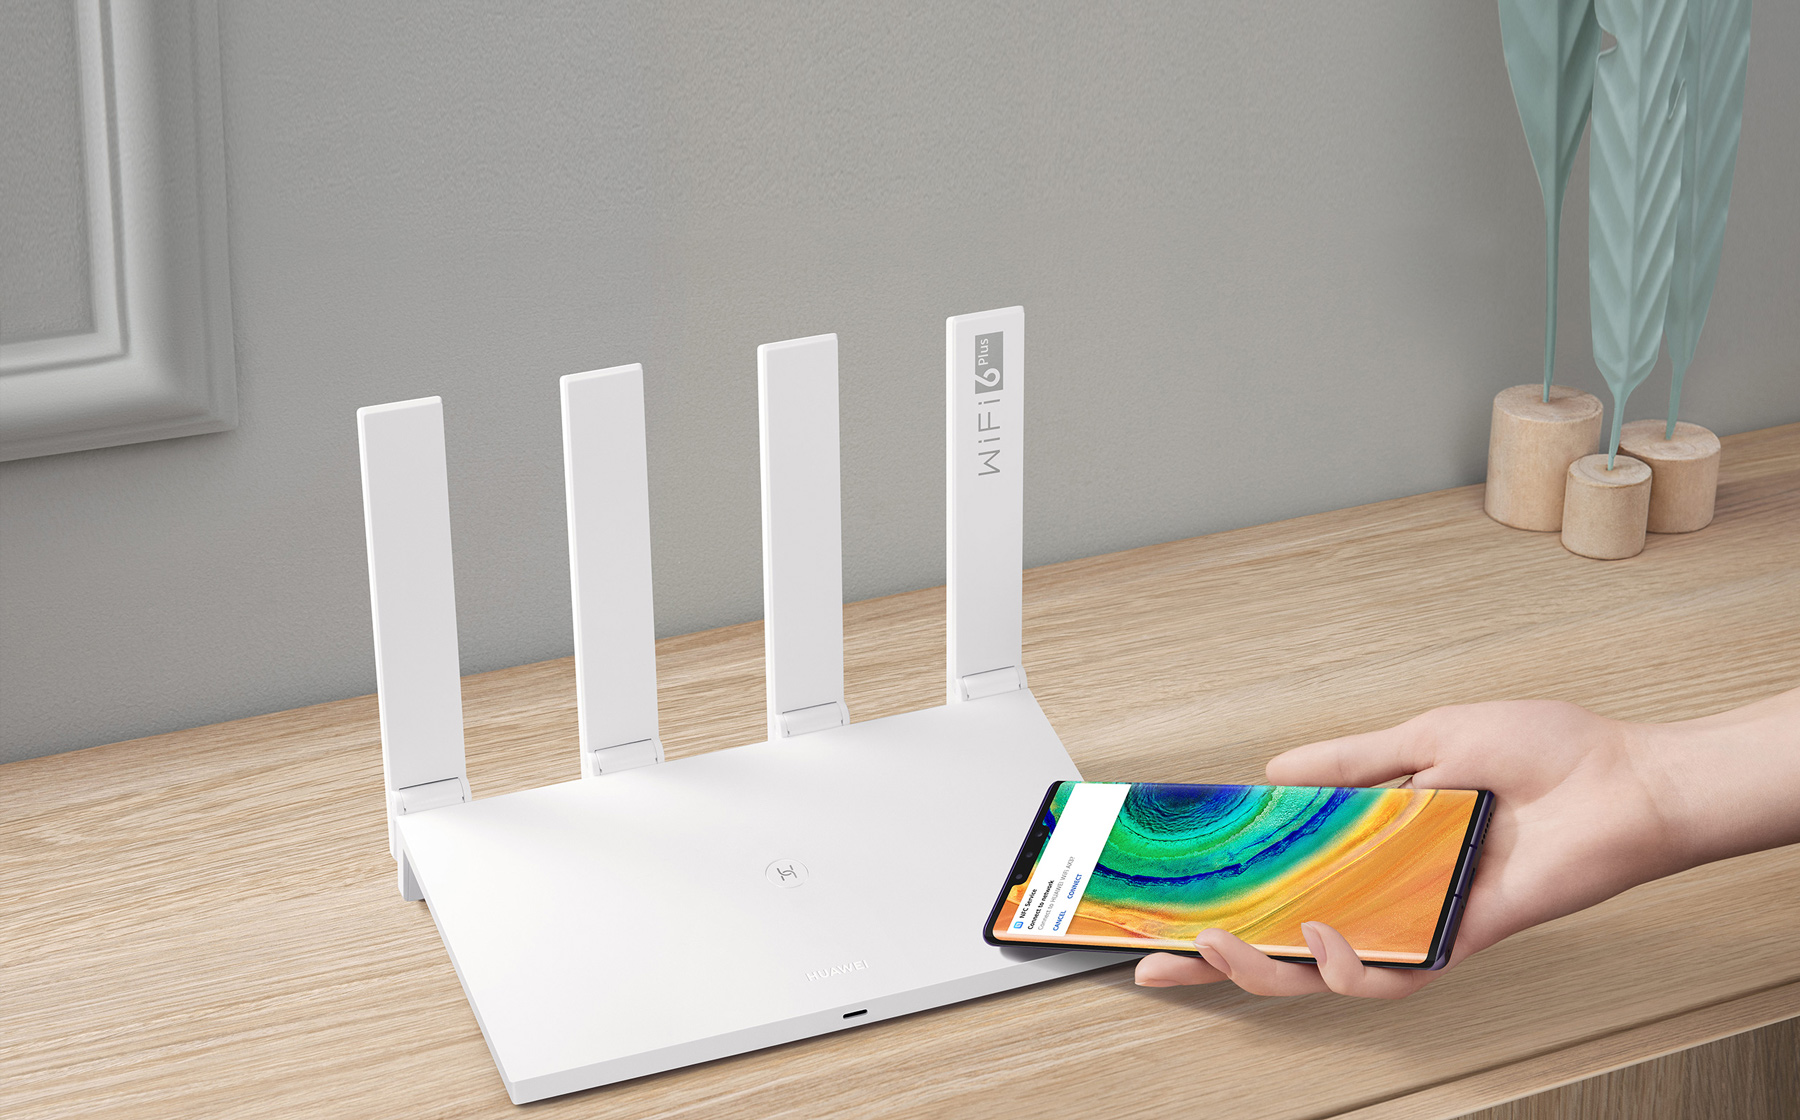 Беспроводной маршрутизатор Huawei AX3 Quad-Core WiFi 6+ MESH Gigabit Router HUAWEI - фото 6